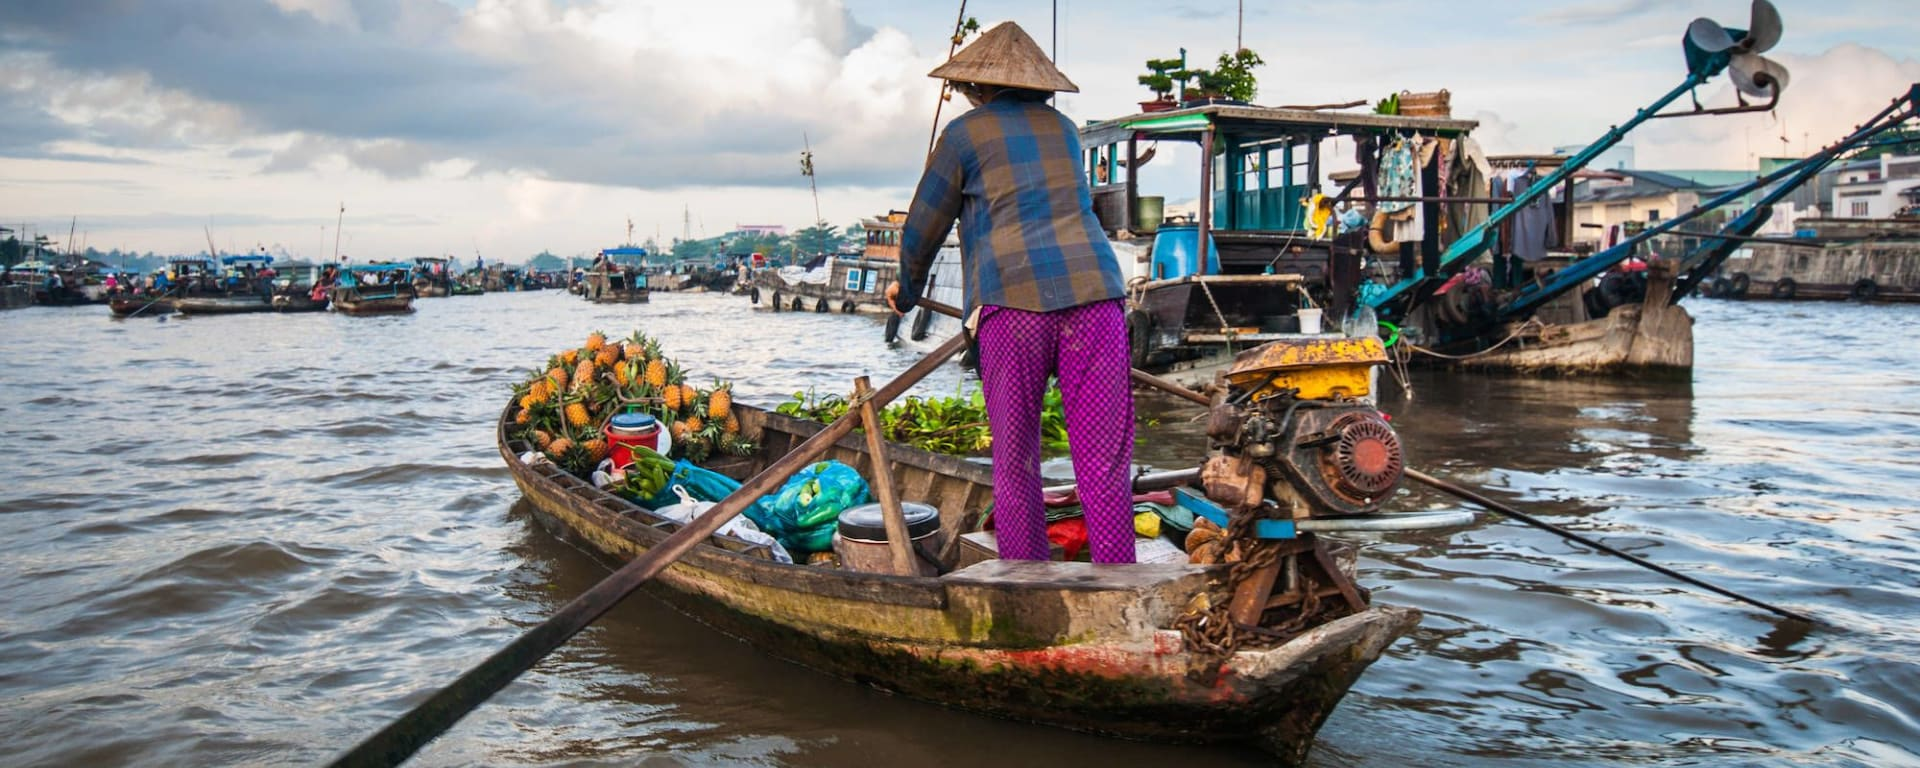 Das Mekong Delta aktiv erleben ab Saigon: Mekong Delta: